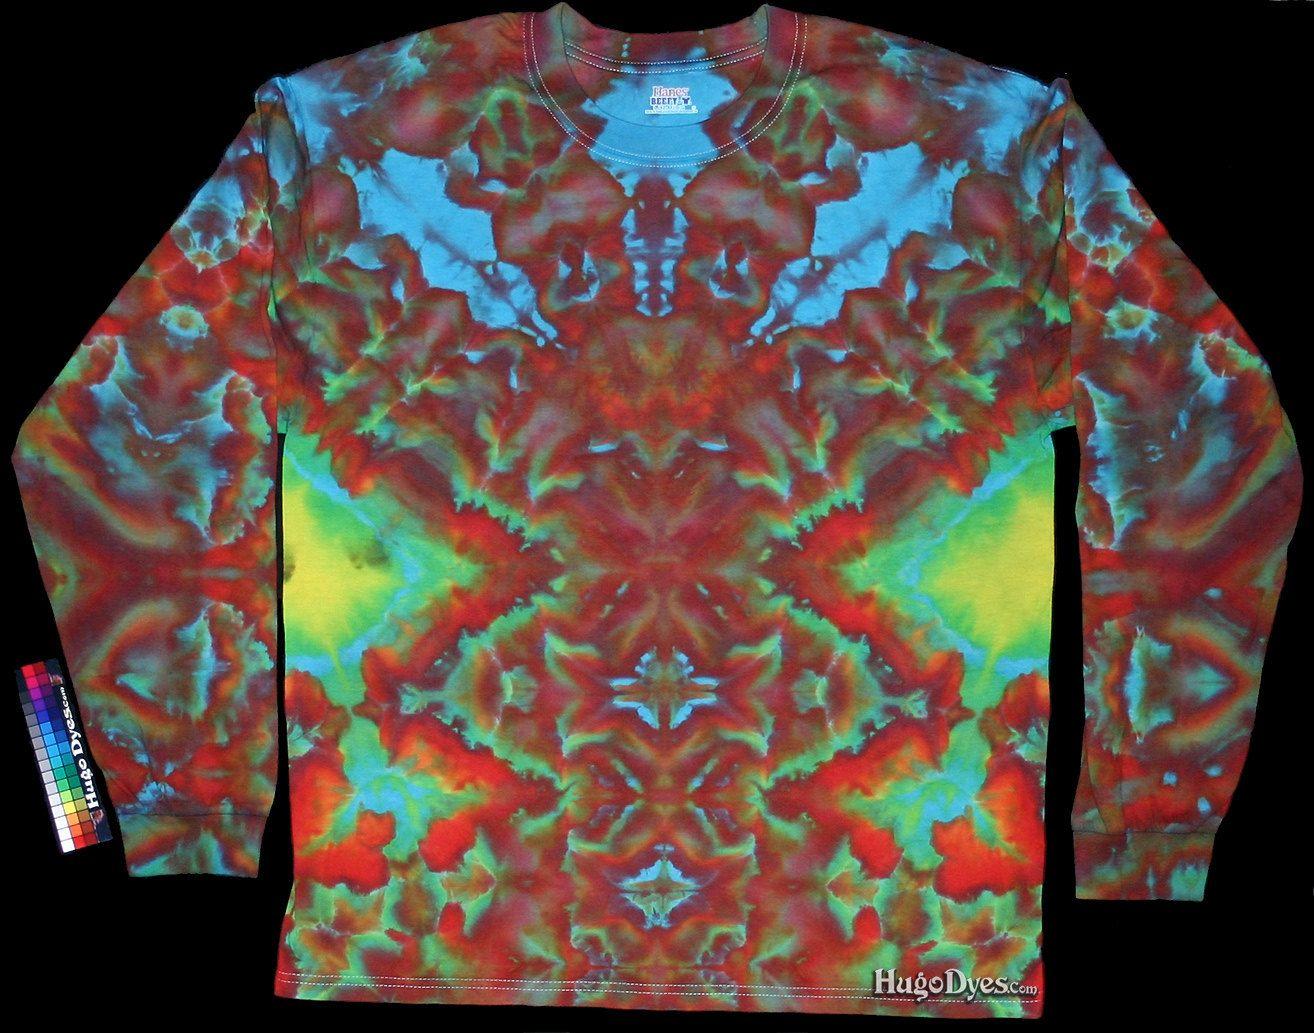 39+ Astonishing Tie dye tattoo shirt ideas